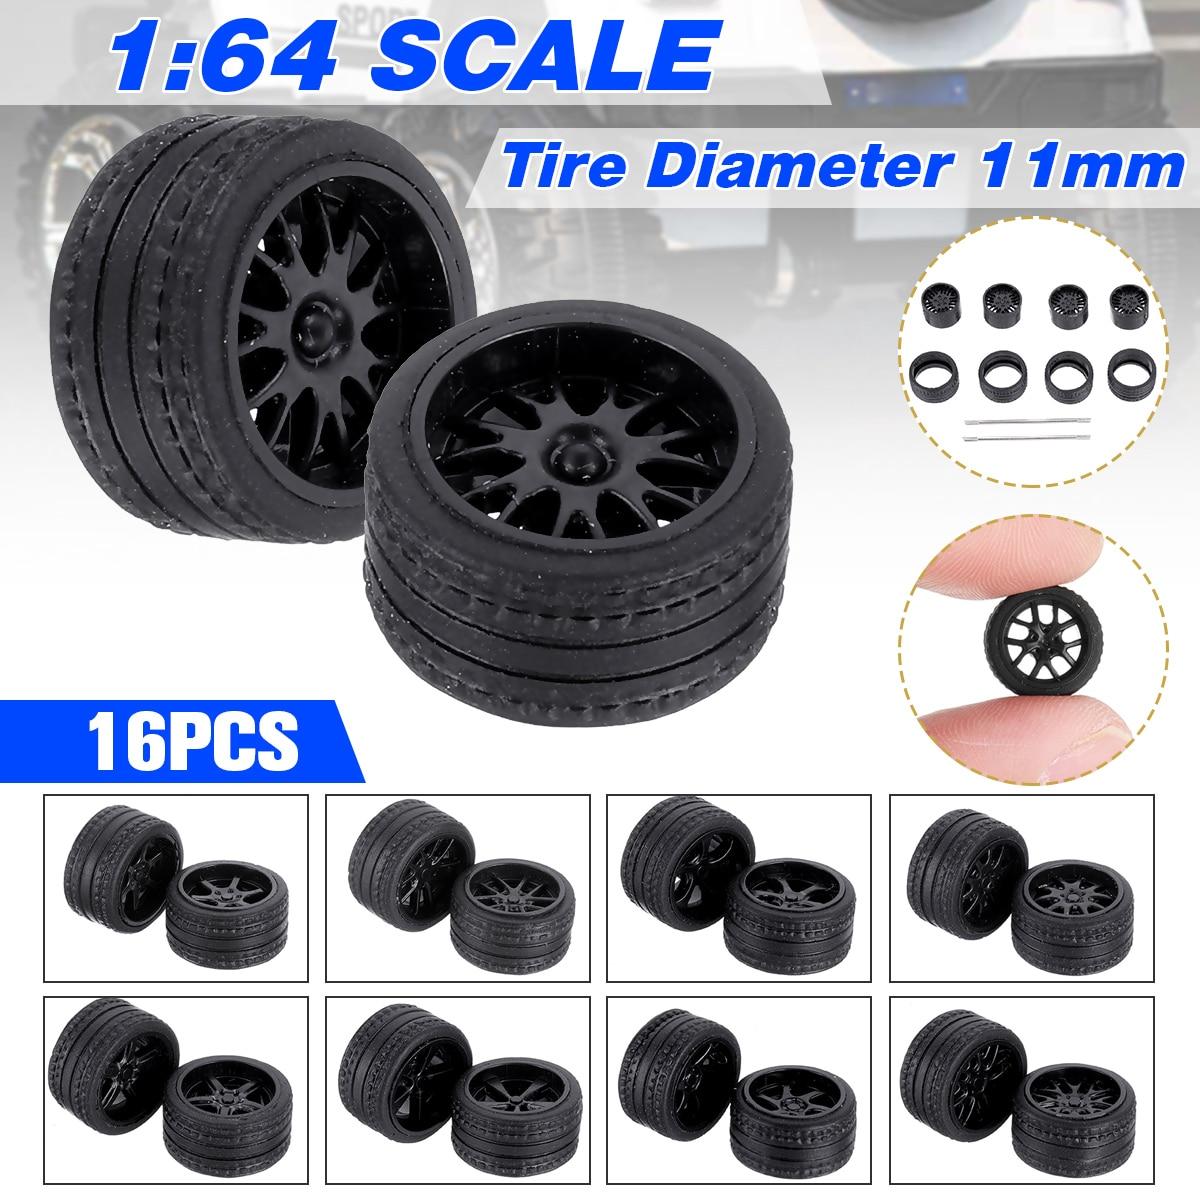 16PCS/Four Boxes 1:64 ABS Rubber Wheels Tire Set Axles Vehicle Wheels Tire Modified Alloy Car Refit Wheels For Vehicle Car Model